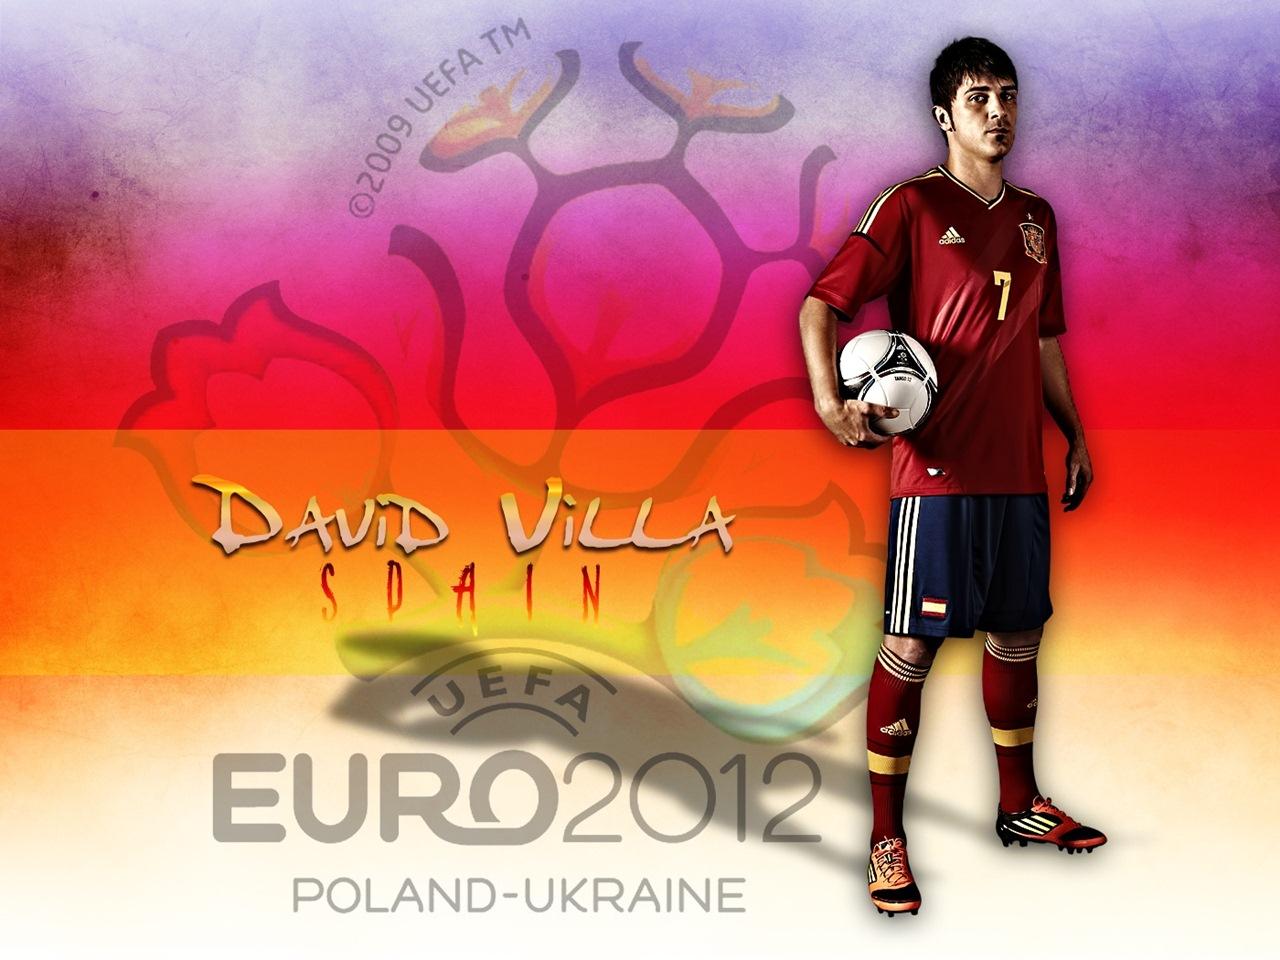 http://3.bp.blogspot.com/-tBj_8WPJRPA/T8tLbMftLFI/AAAAAAAAB7c/K7vAQFNndrs/s1600/David_Villa_Euro_2012_Cup_Spain_Naitional_Football_Team_Desktop_Wallpaper.jpg